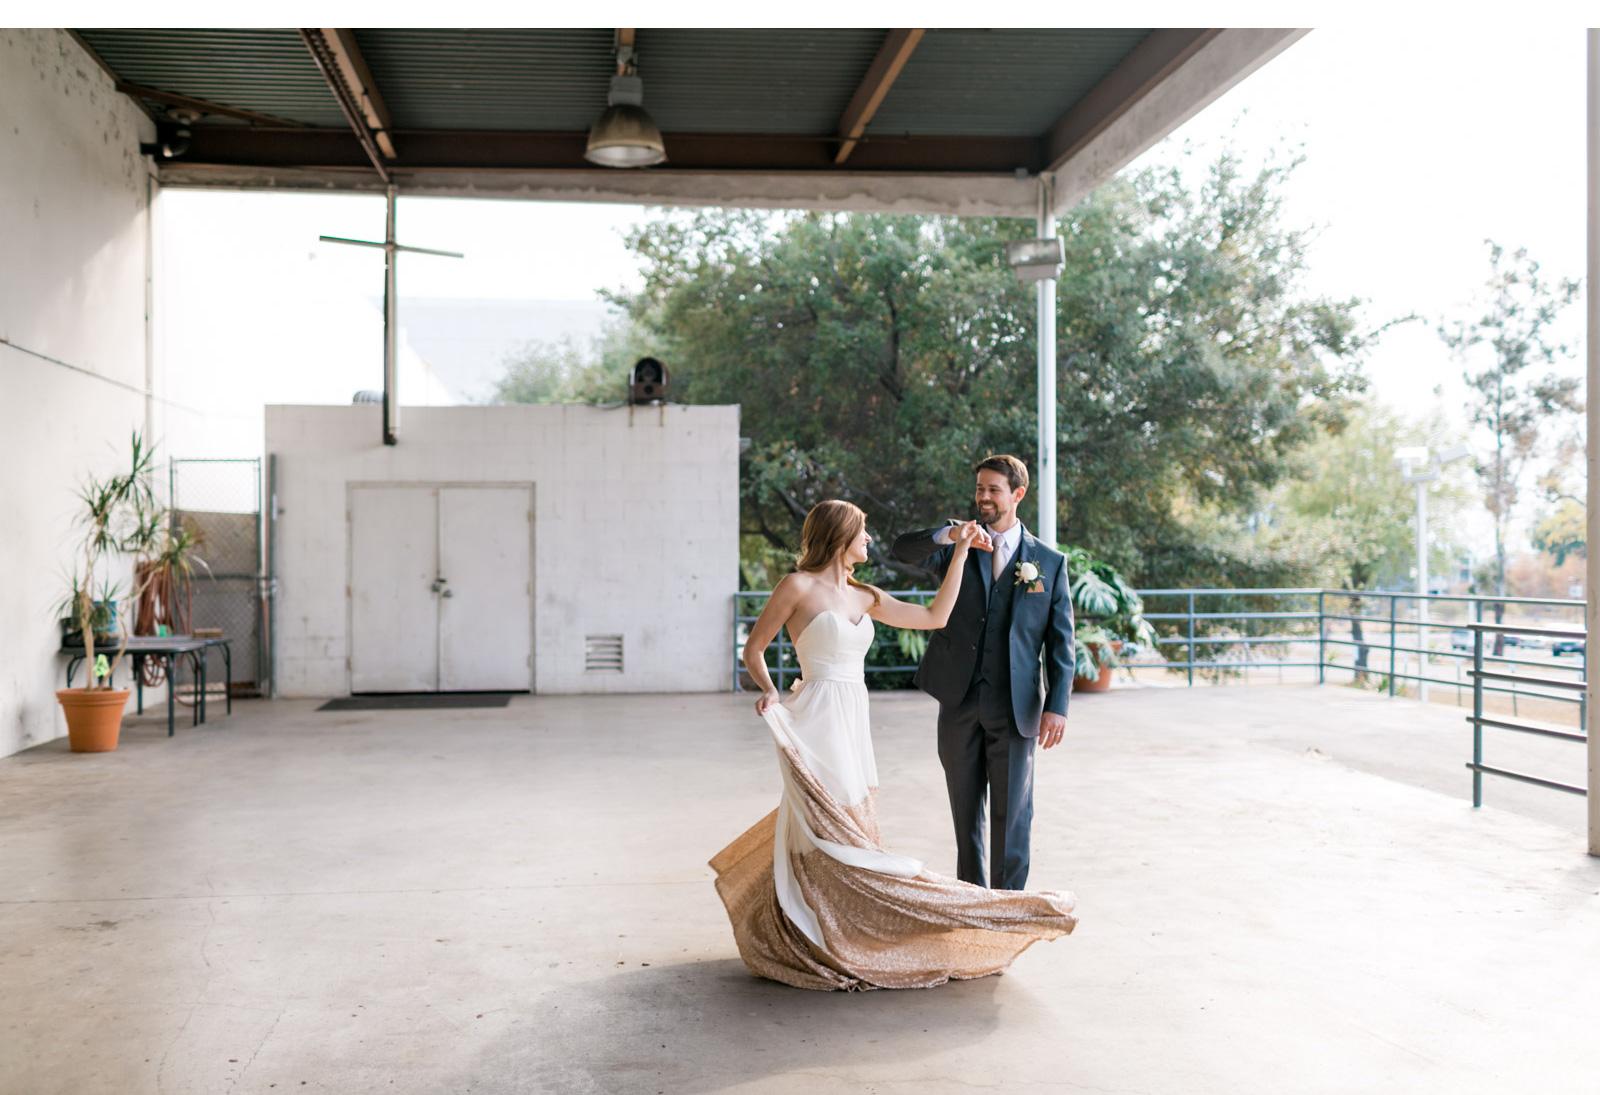 San-Diego-Wedding-Photographer-Natalie-Schutt-Photography_02.jpg